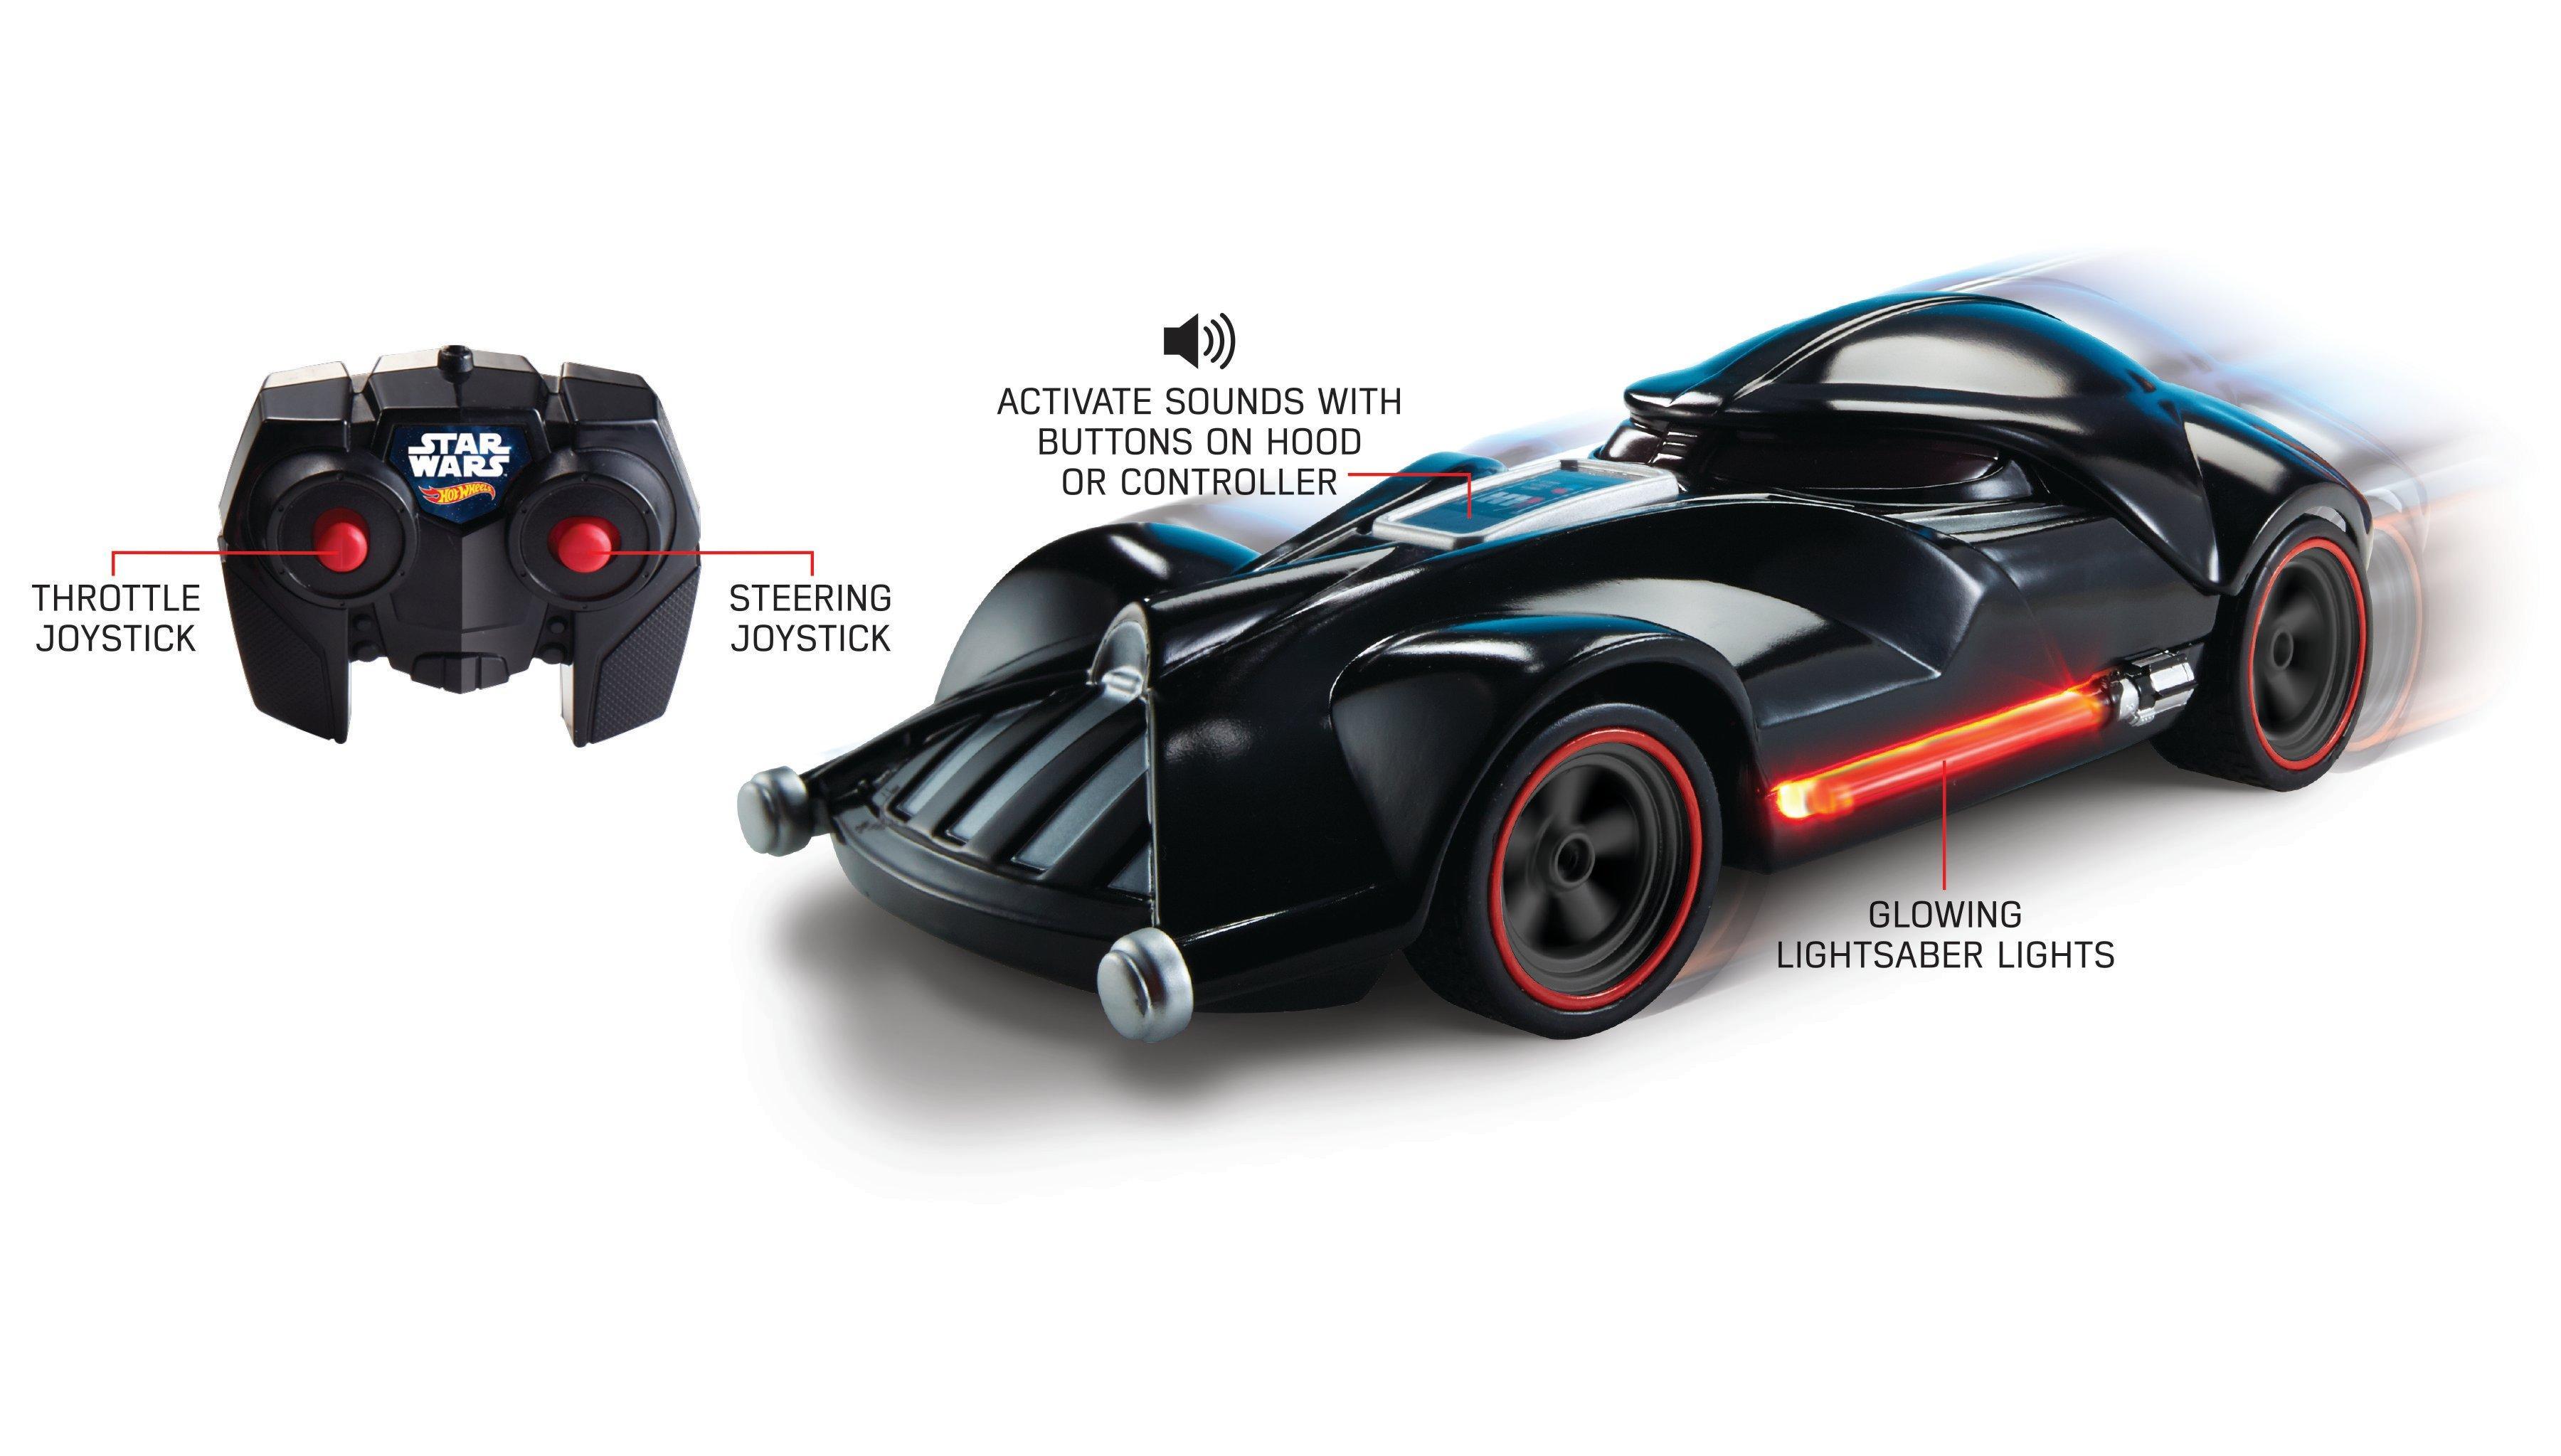 Hot Wheels Star Wars Darth Vader Rc Car Gamestop